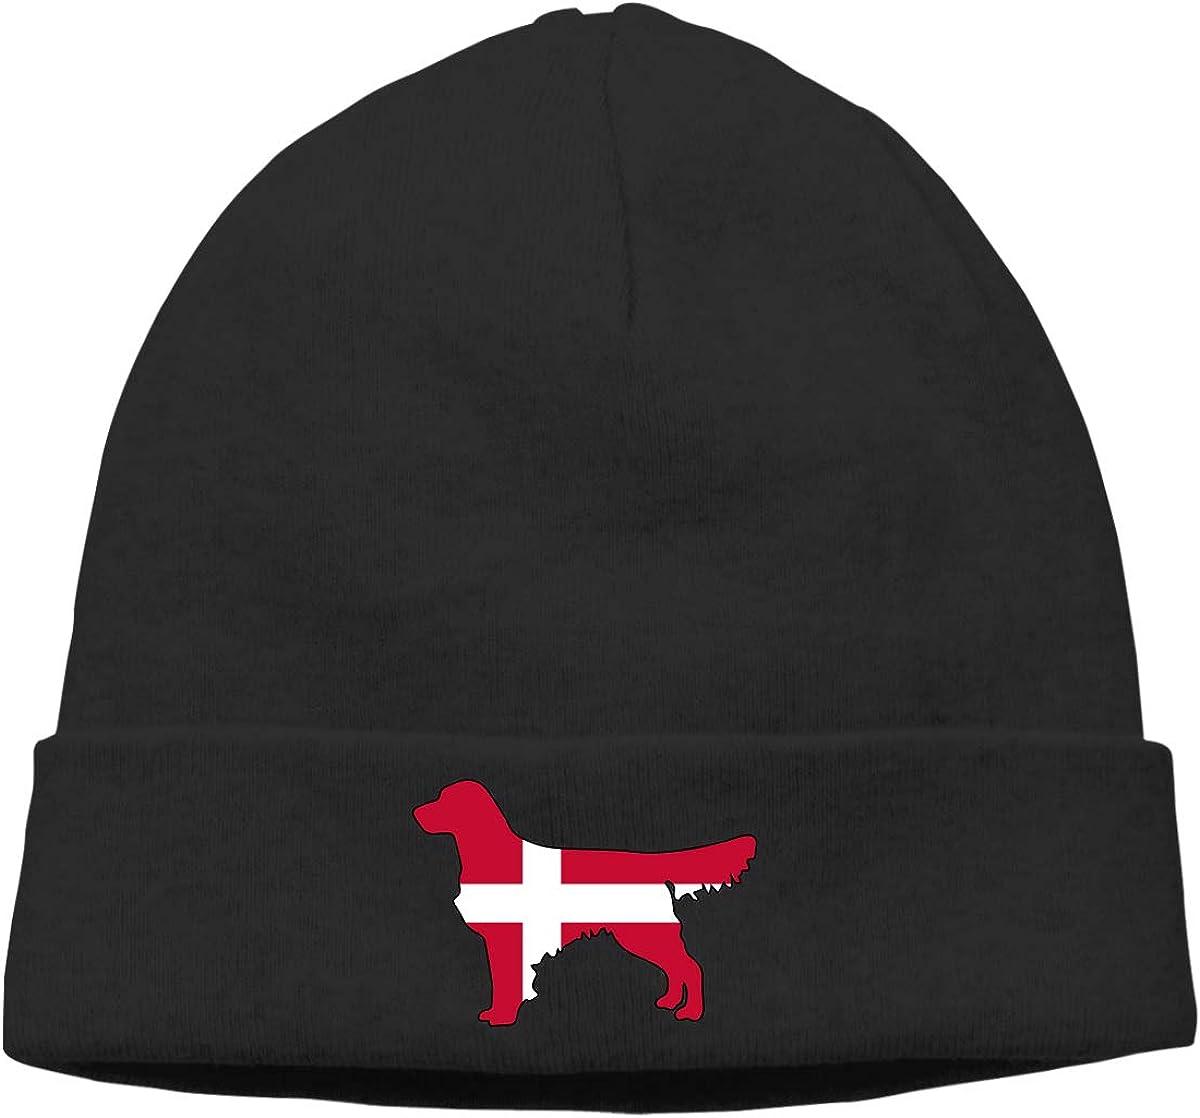 Thin Stretchy /& Soft Winter Cap Denmark Flag Golden Retriever Dogs Men Womens Solid Color Beanie Hat